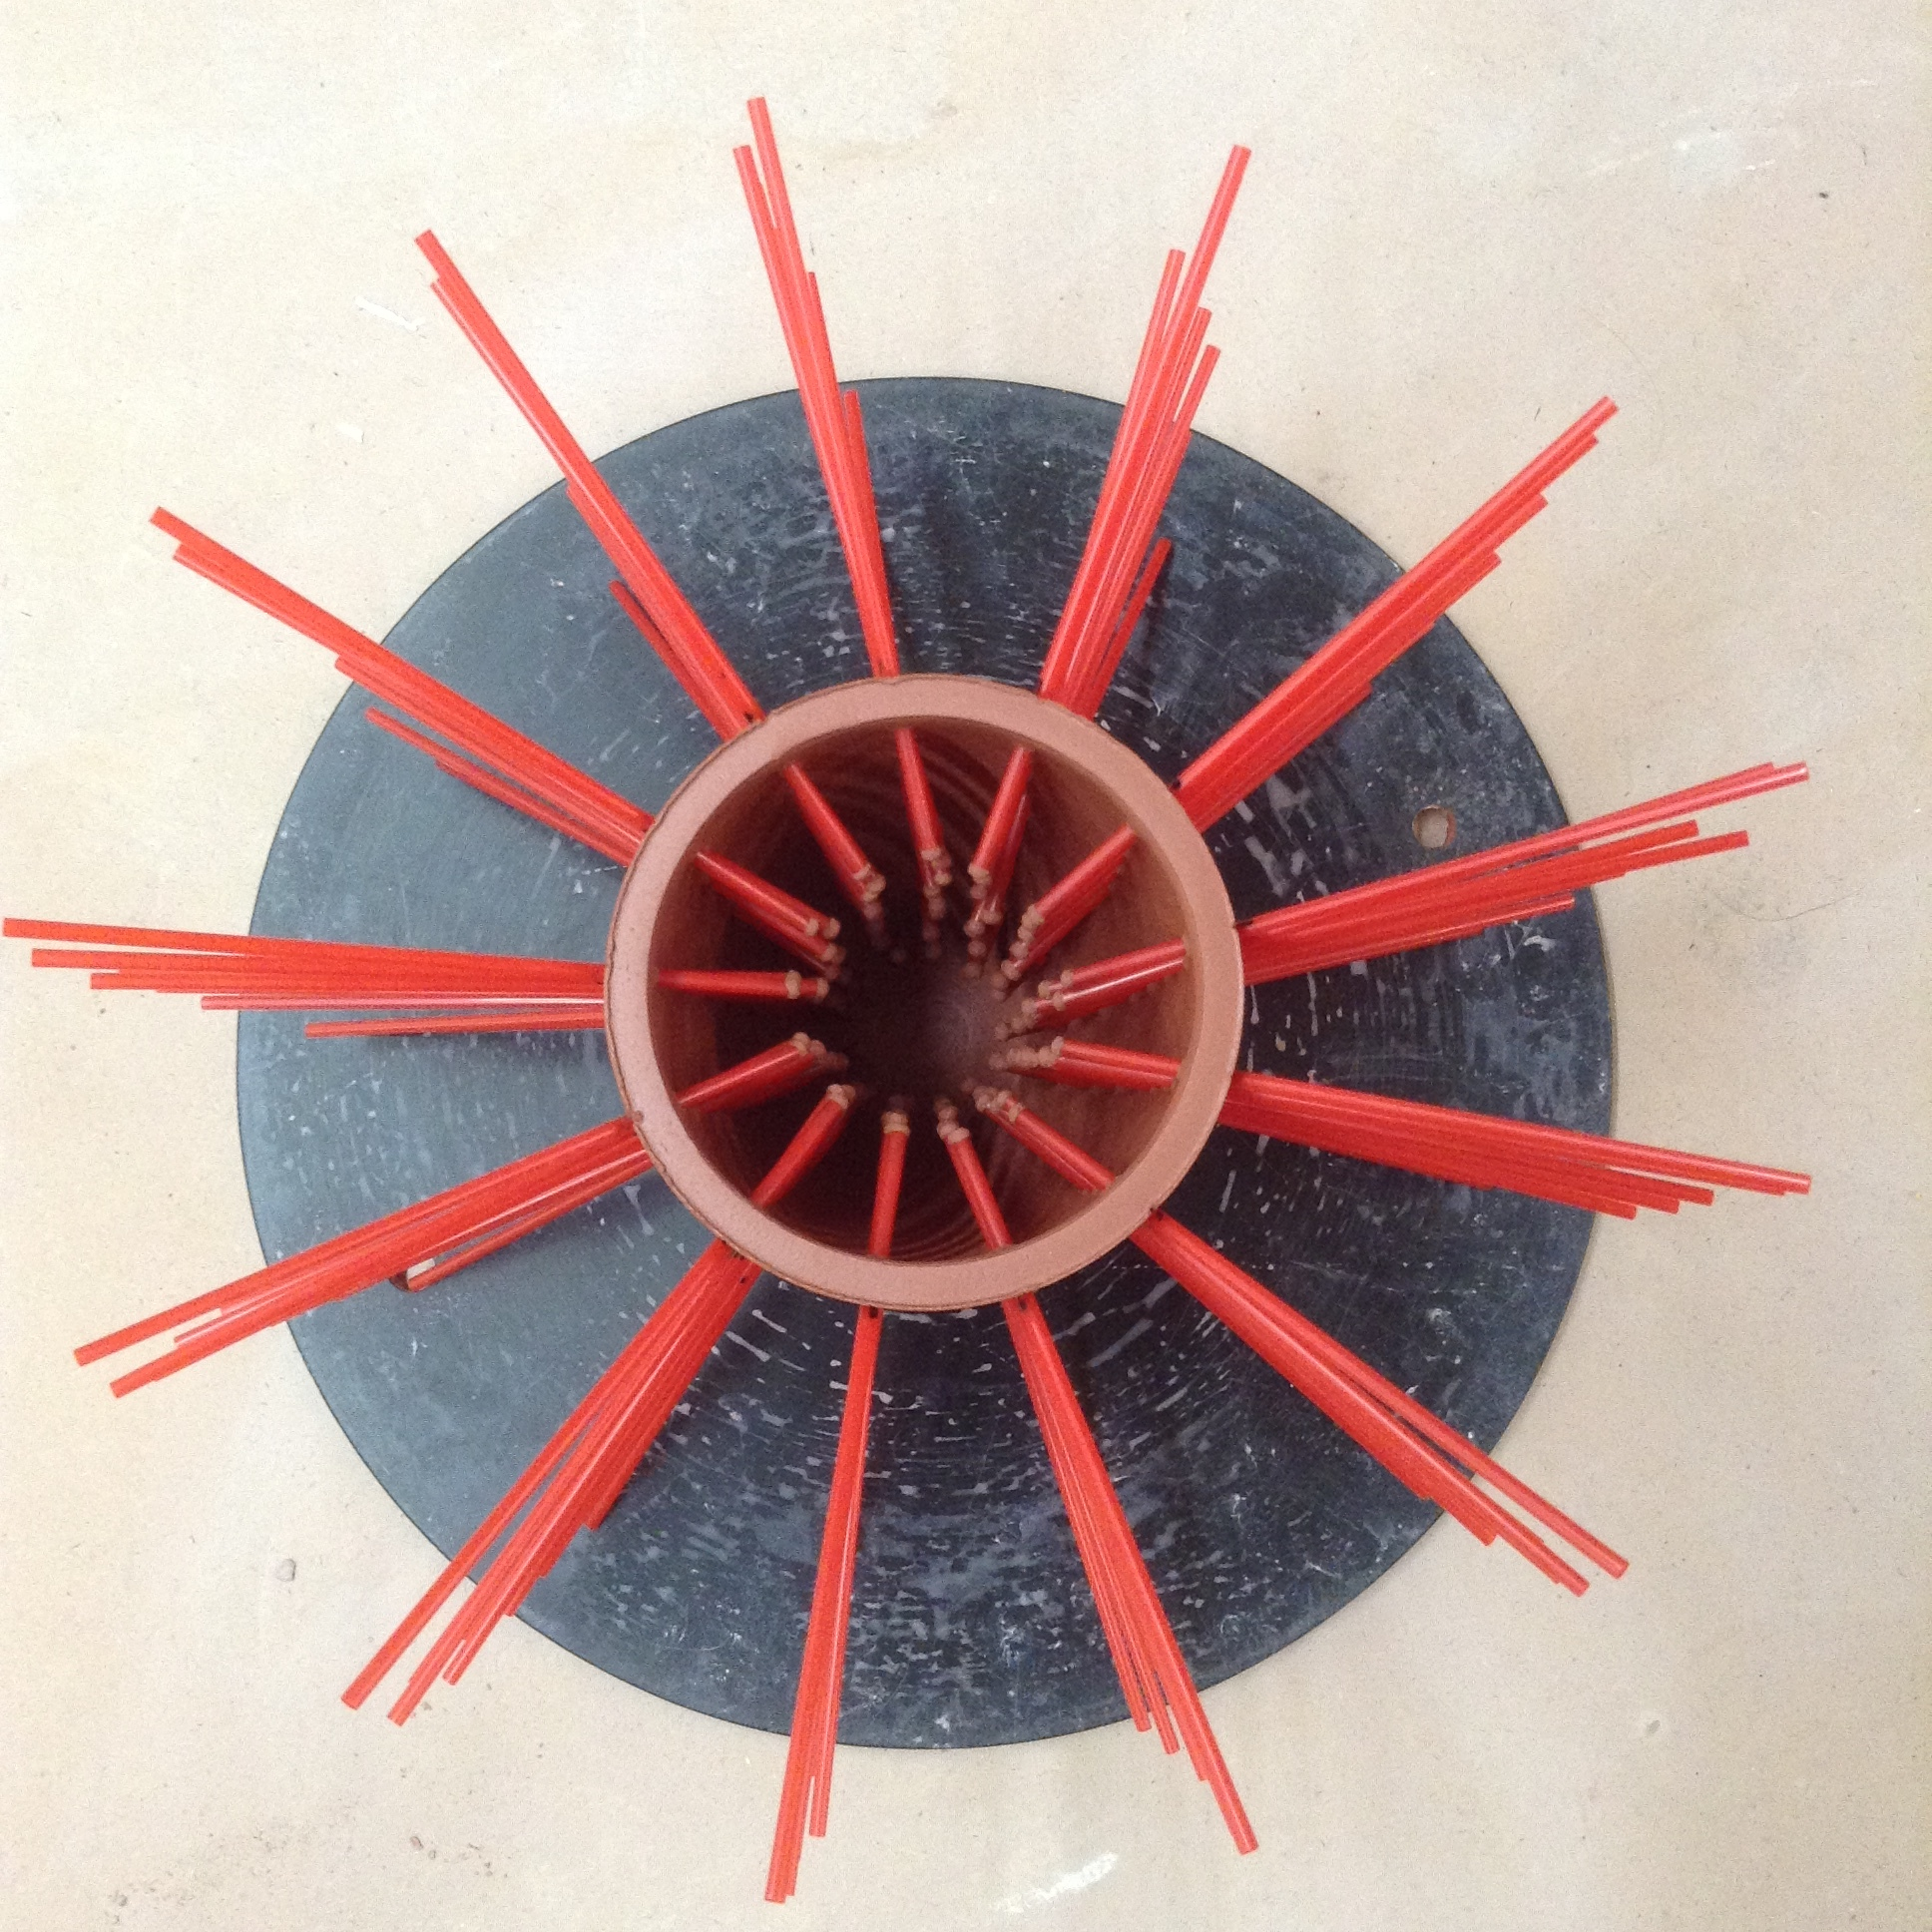 cone straw install process2.JPG